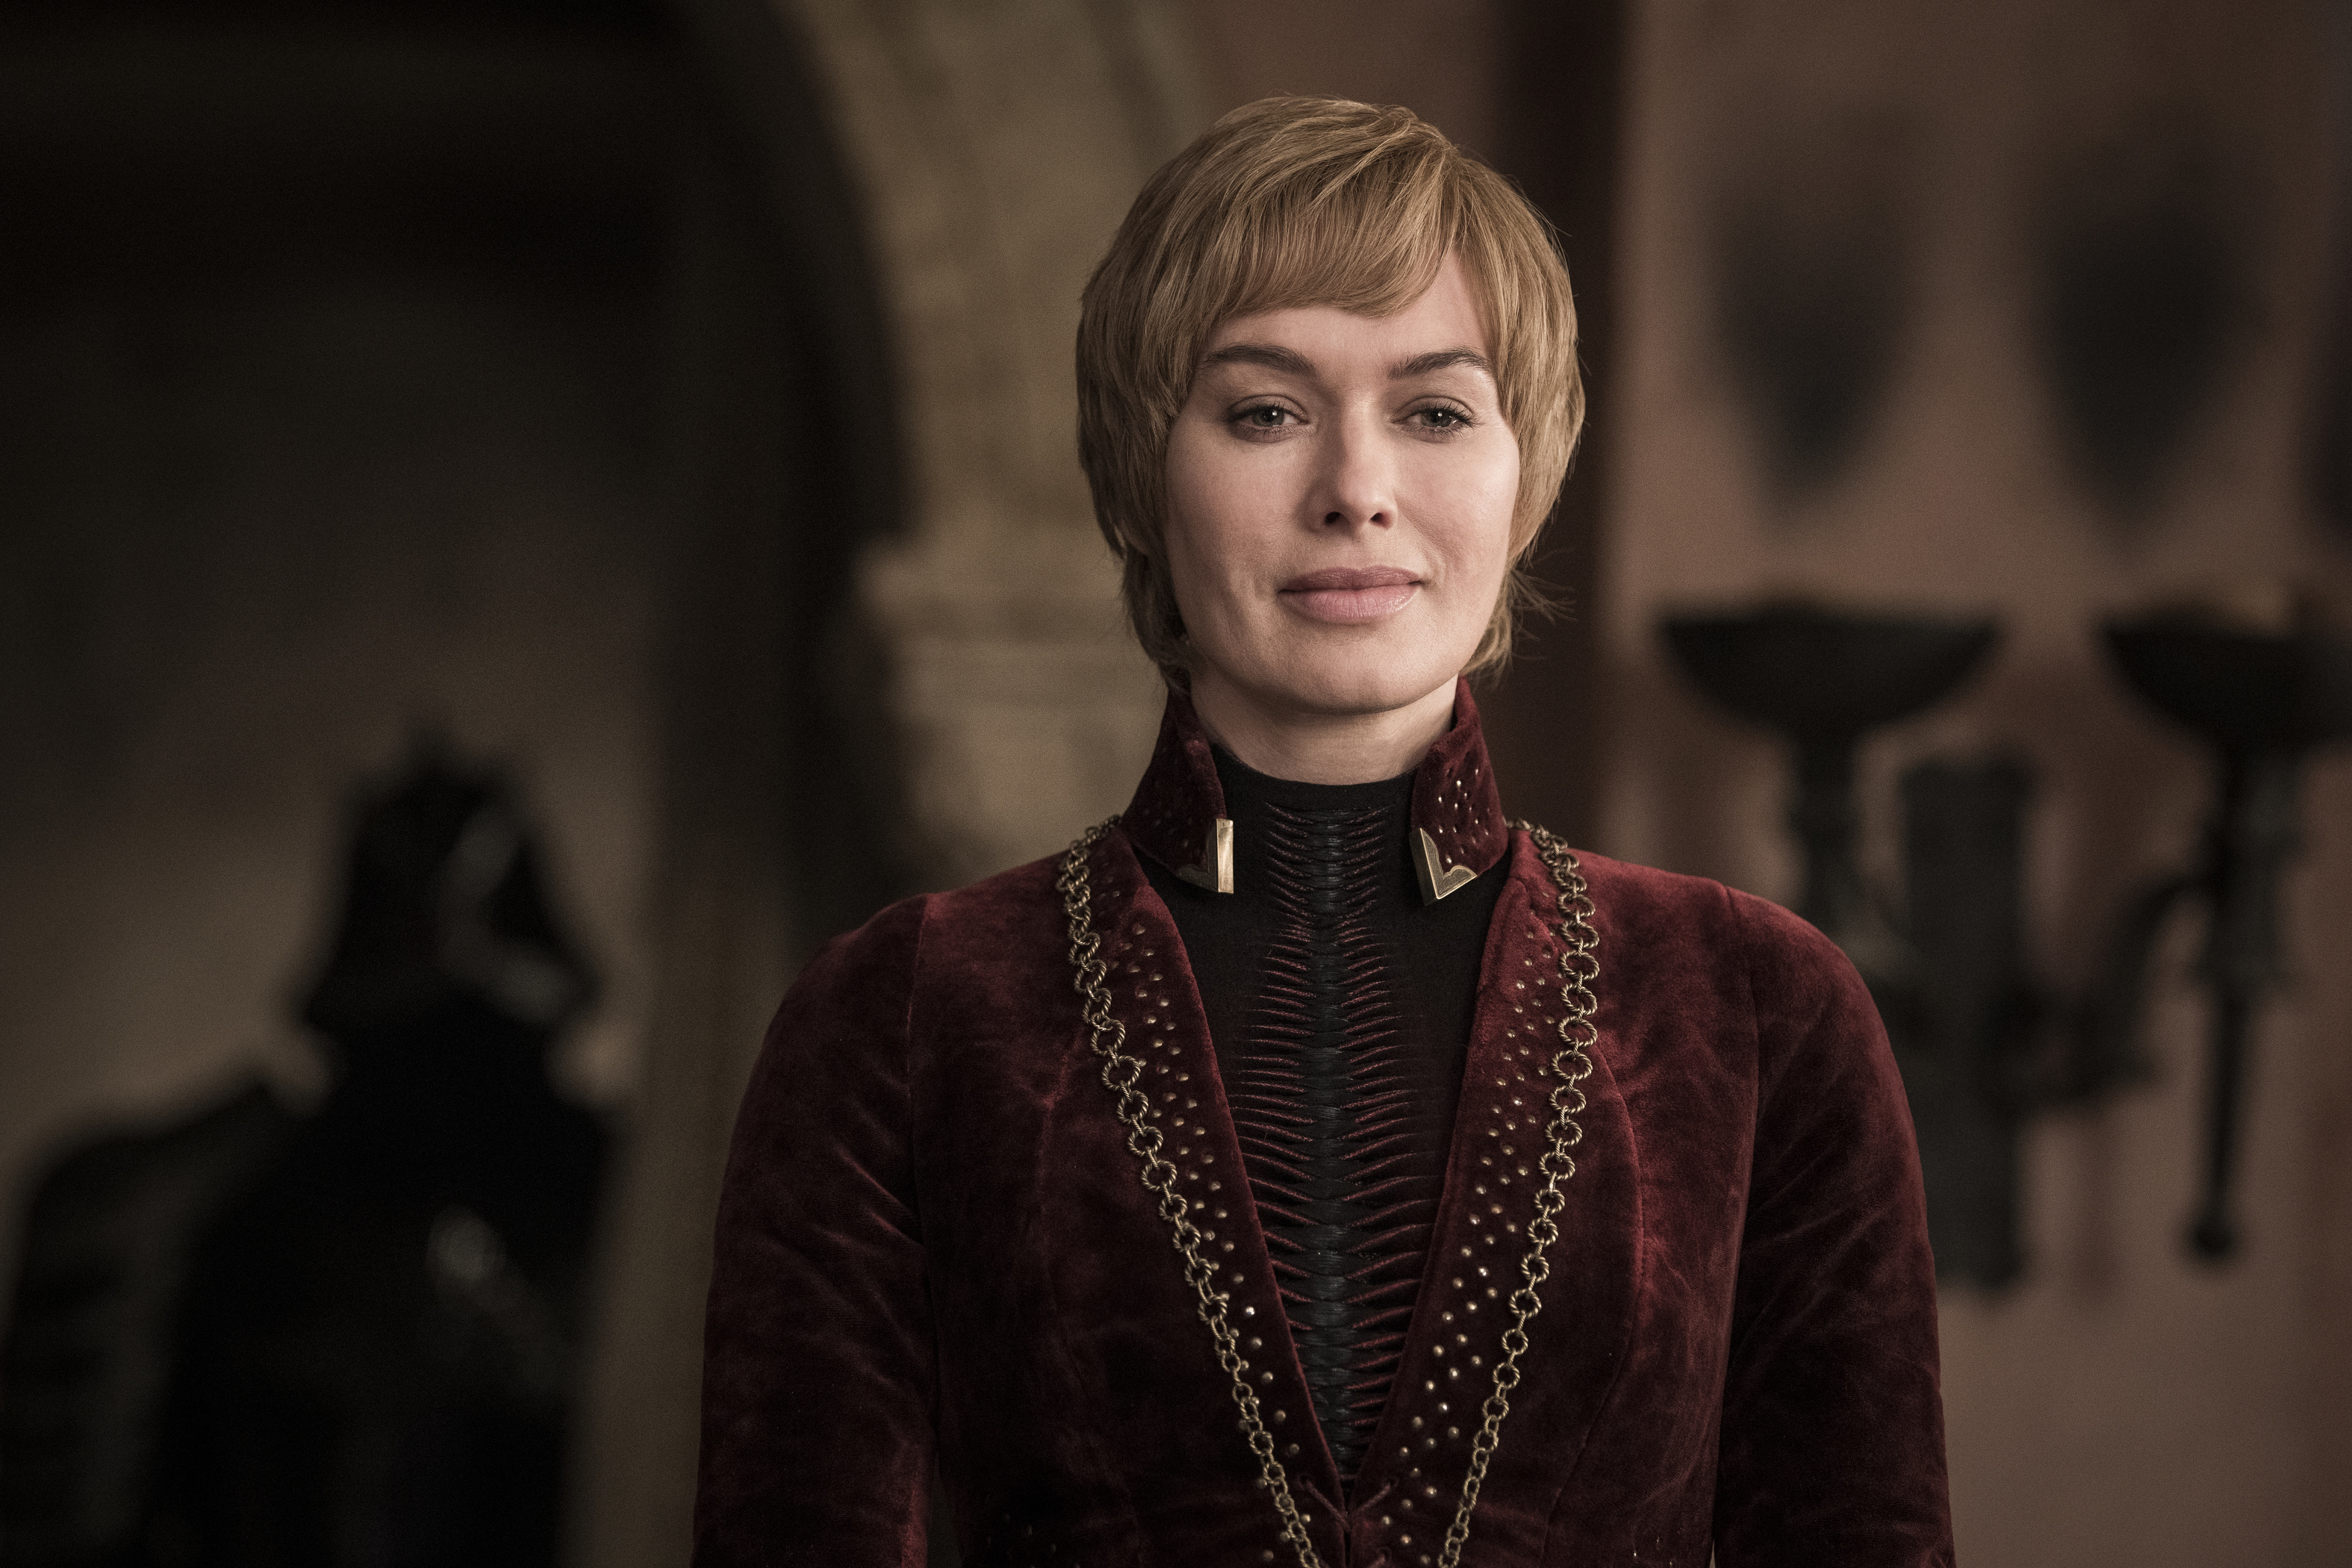 'Game of Thrones' Season 8's Greatest Sin Was Wasting Lena Headey